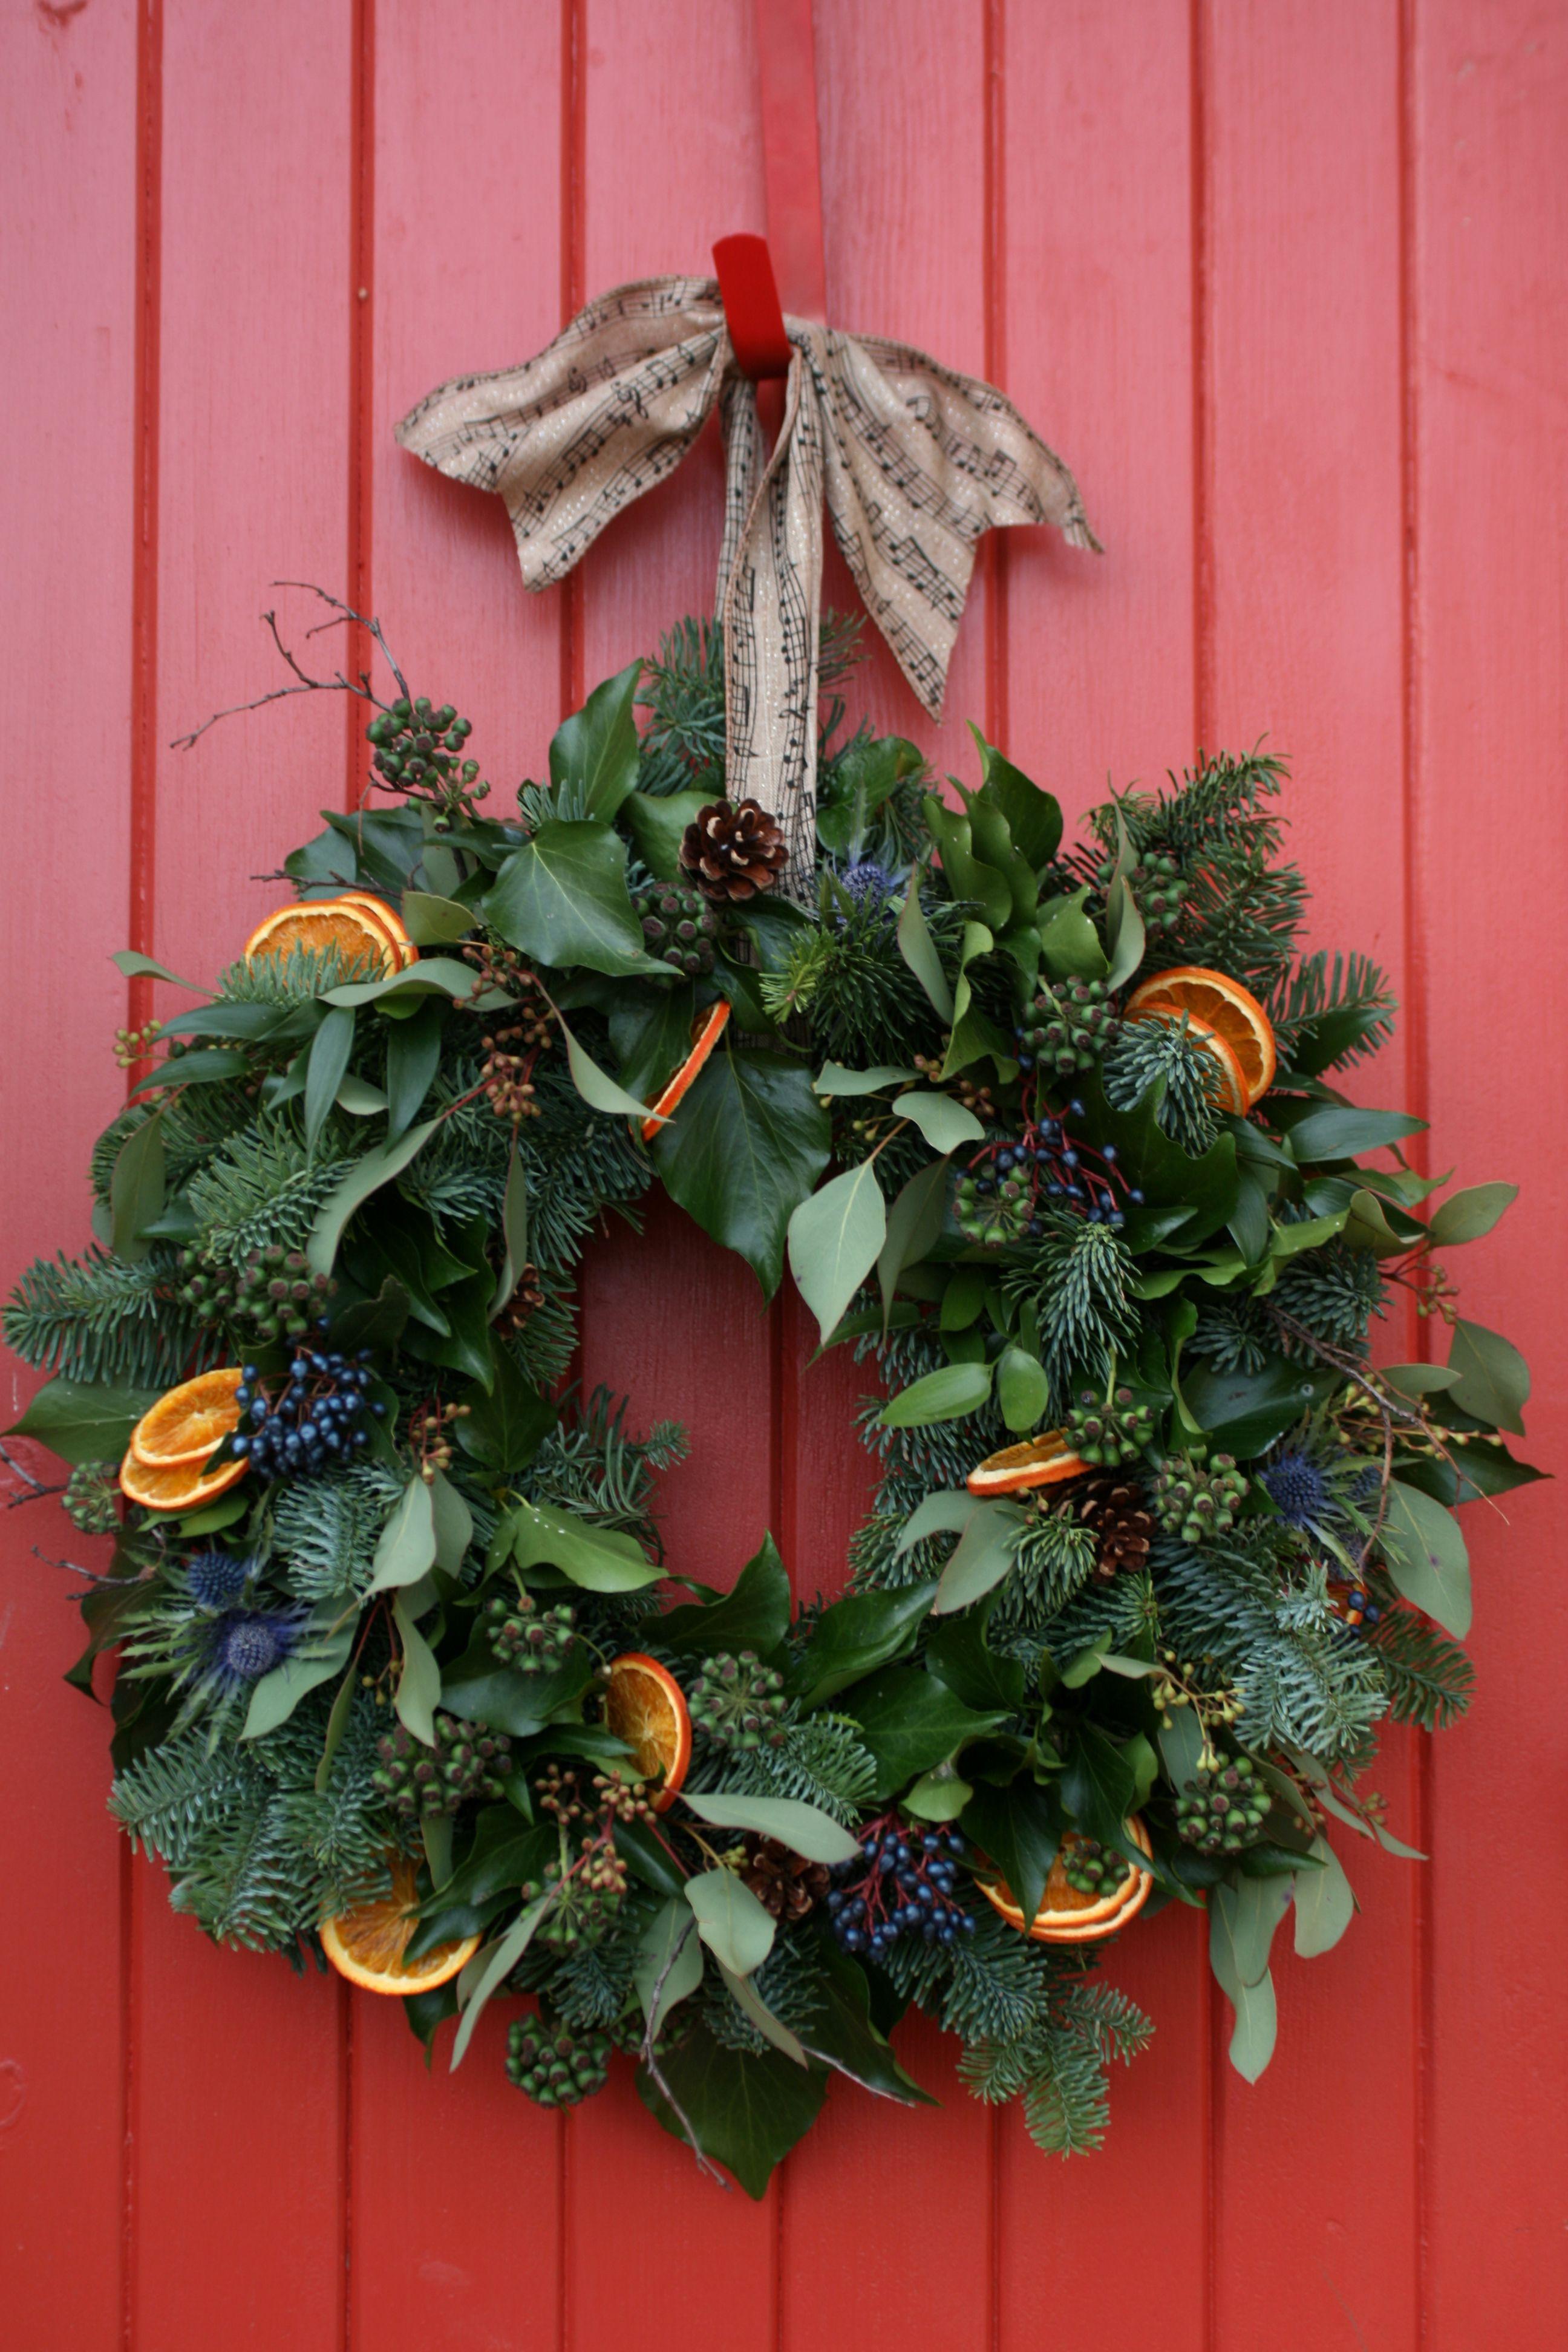 christmas wreath with ivy, viburnum tinus, eucalyptus